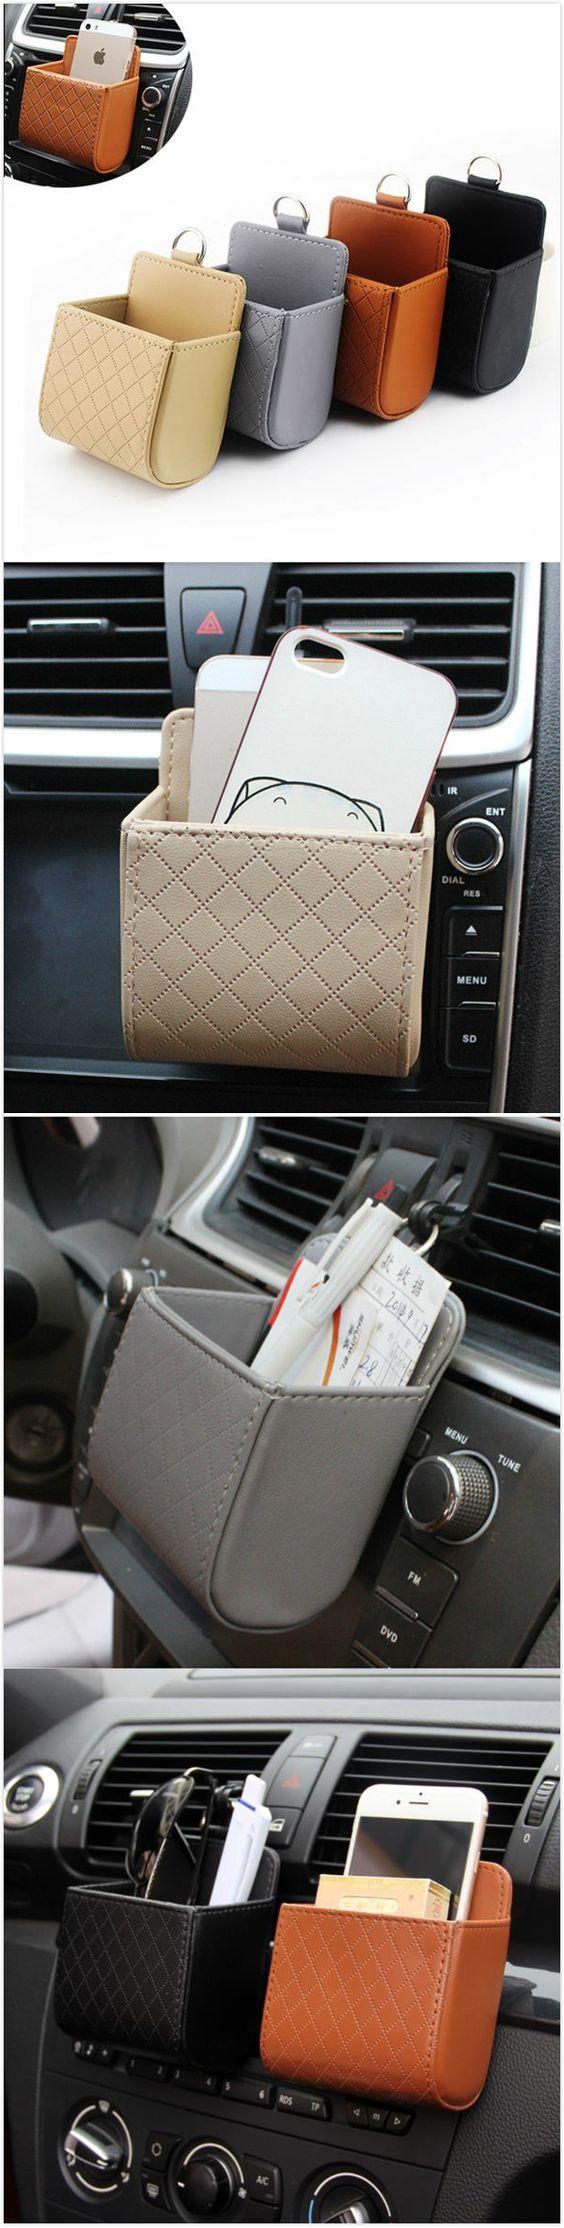 [$ 4.28] Auto Air Vent Car Storage Bag Multi-functional Pu Phone Bag Ditty Bag